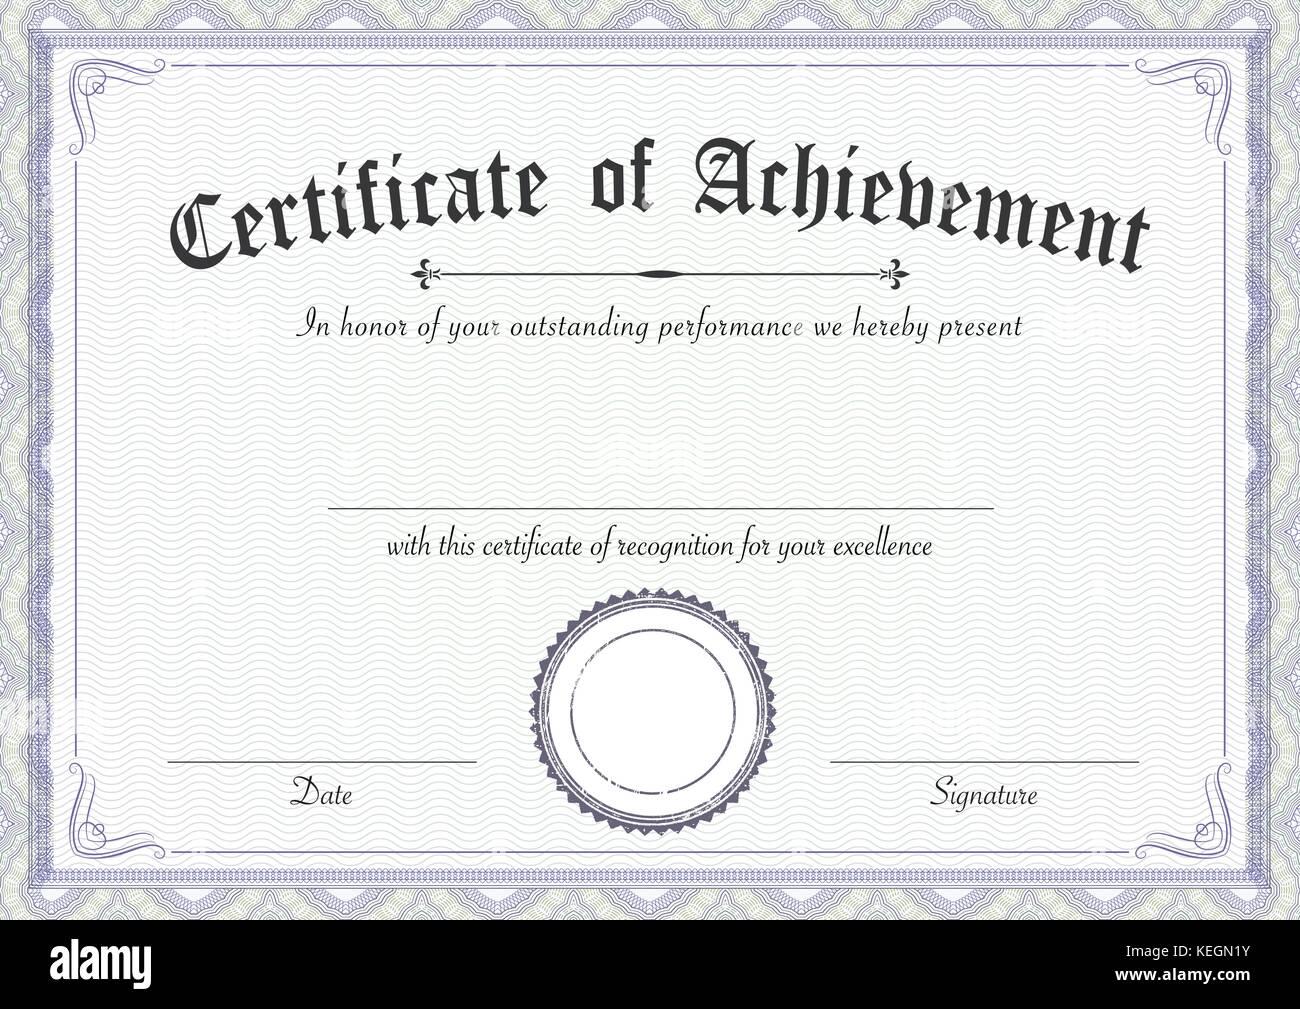 Degree Certificate Stockfotos & Degree Certificate Bilder - Alamy